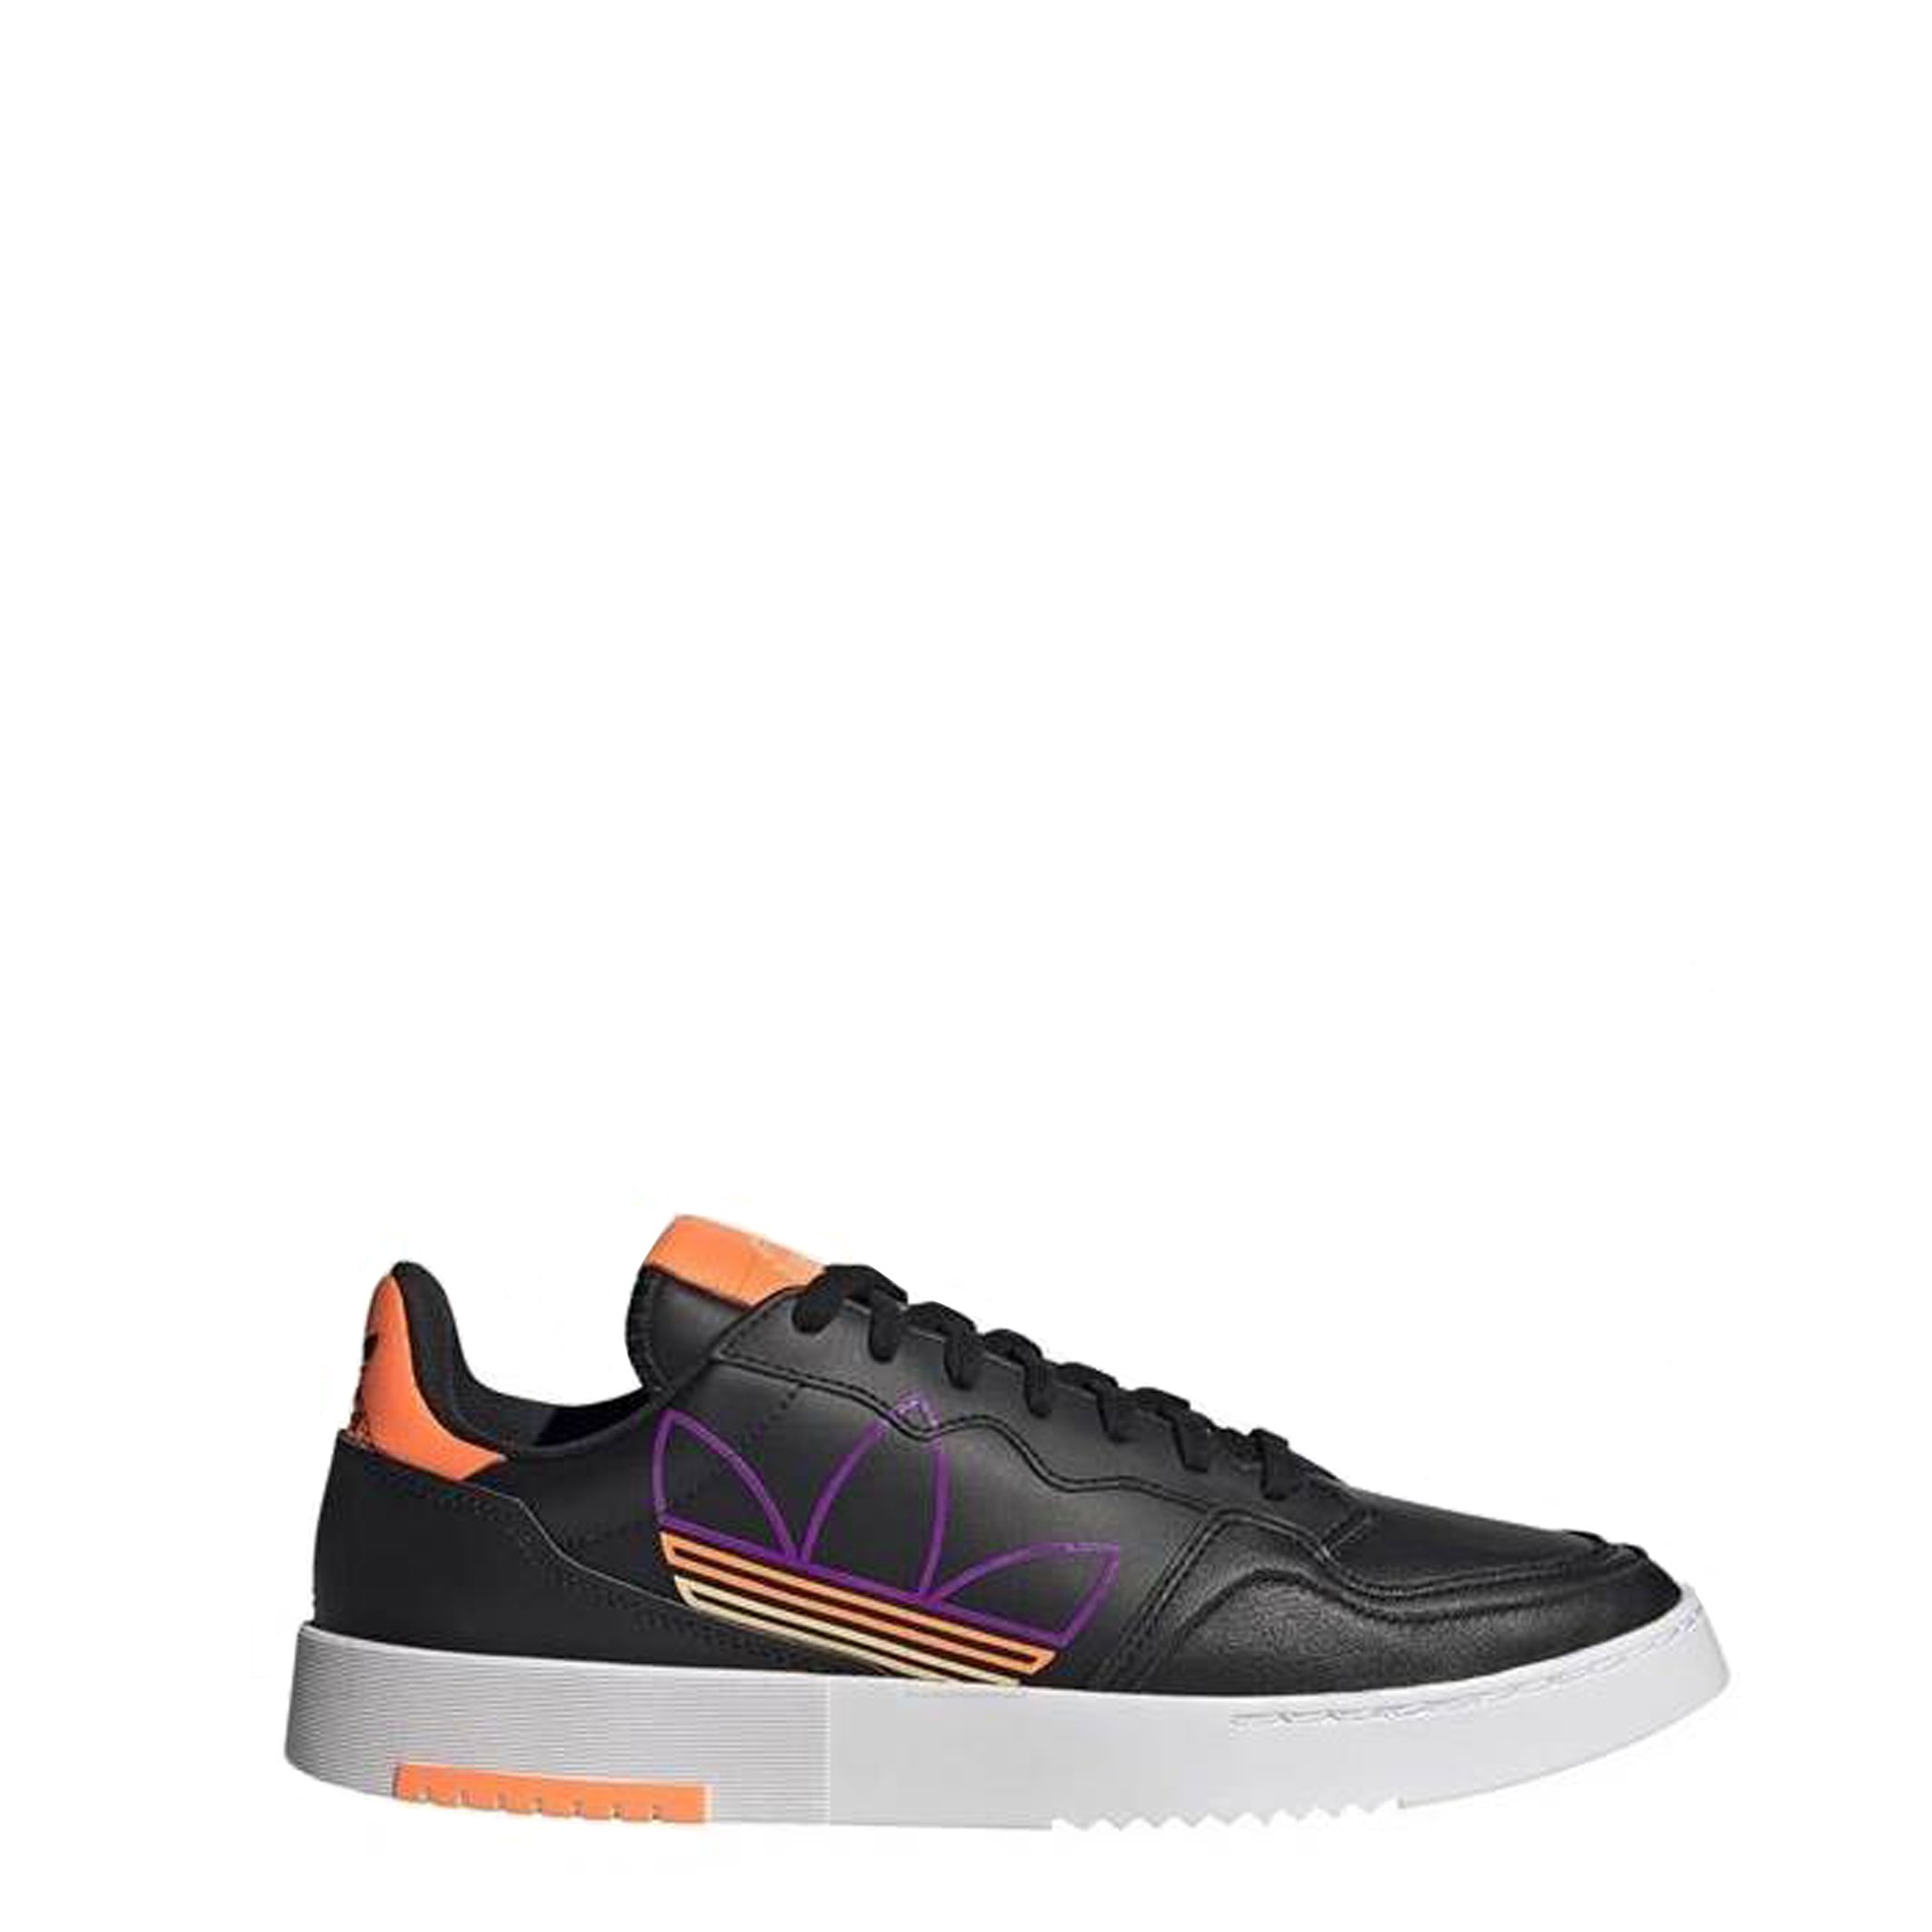 Adidas Unisex Trainer Various Colours FX5707_Supercourt - black UK 6.5